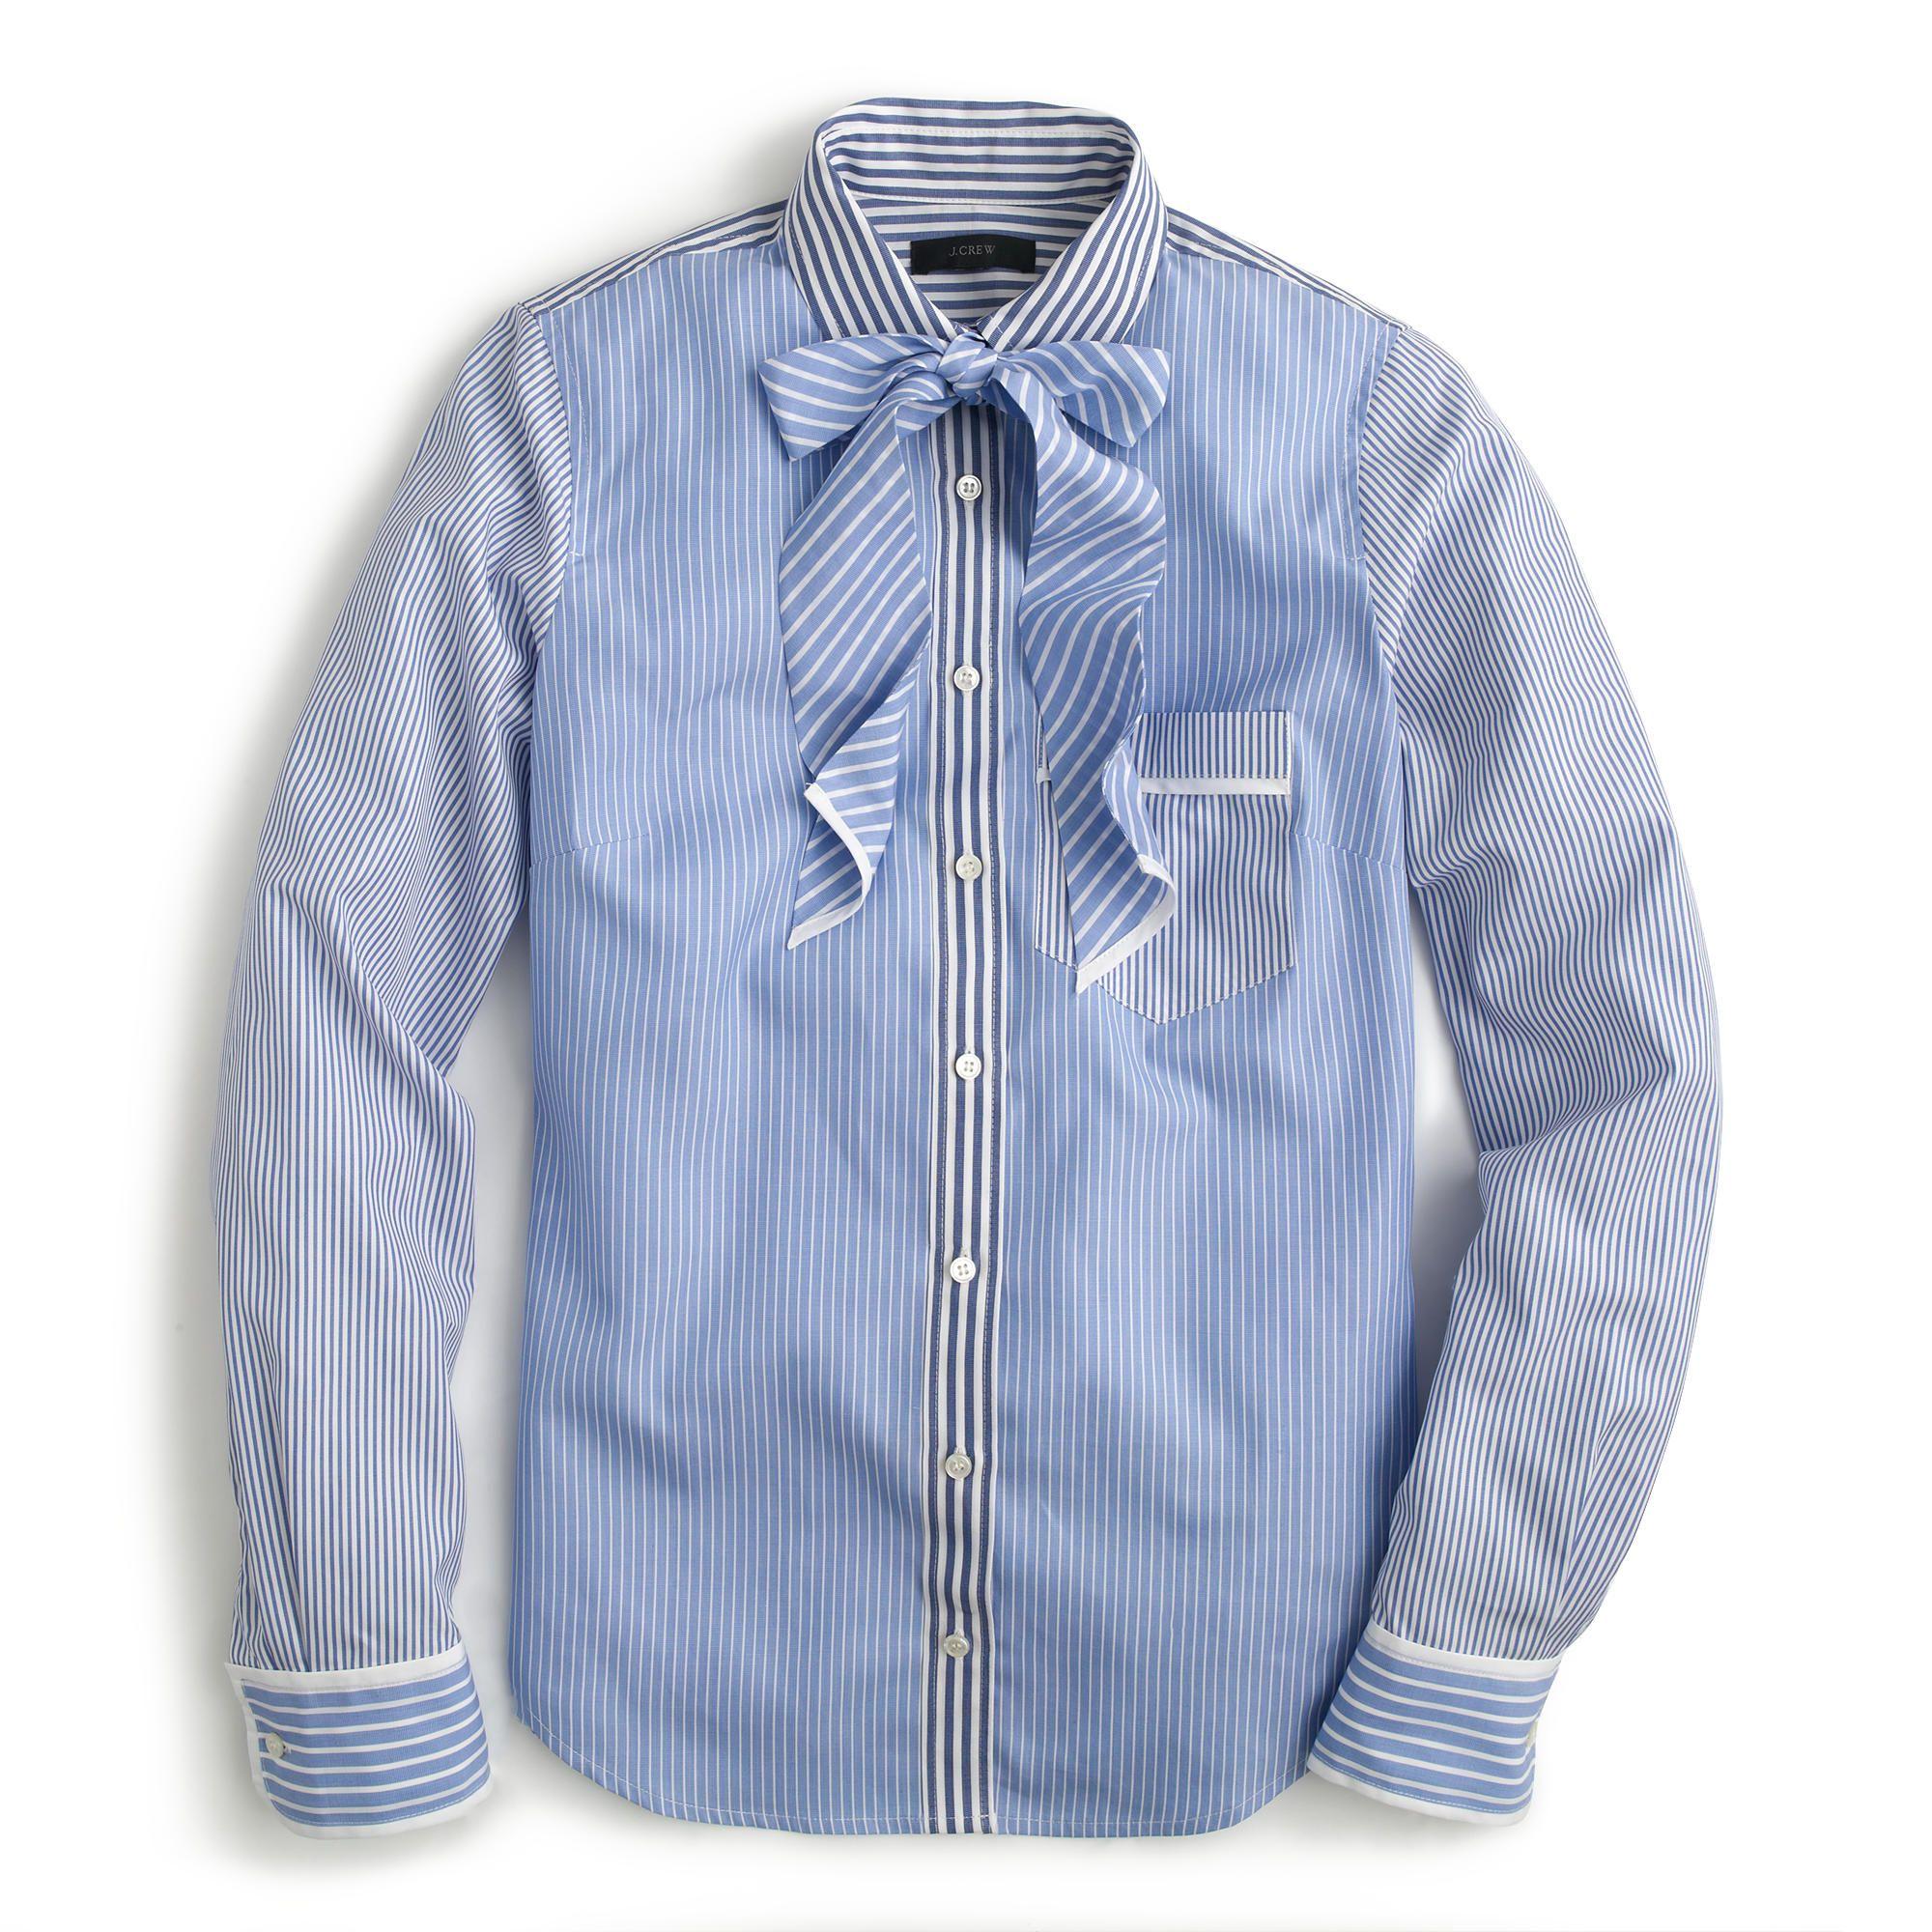 J.Crew - Collection Thomas Mason for J.Crew cocktail shirt Size 4 ...